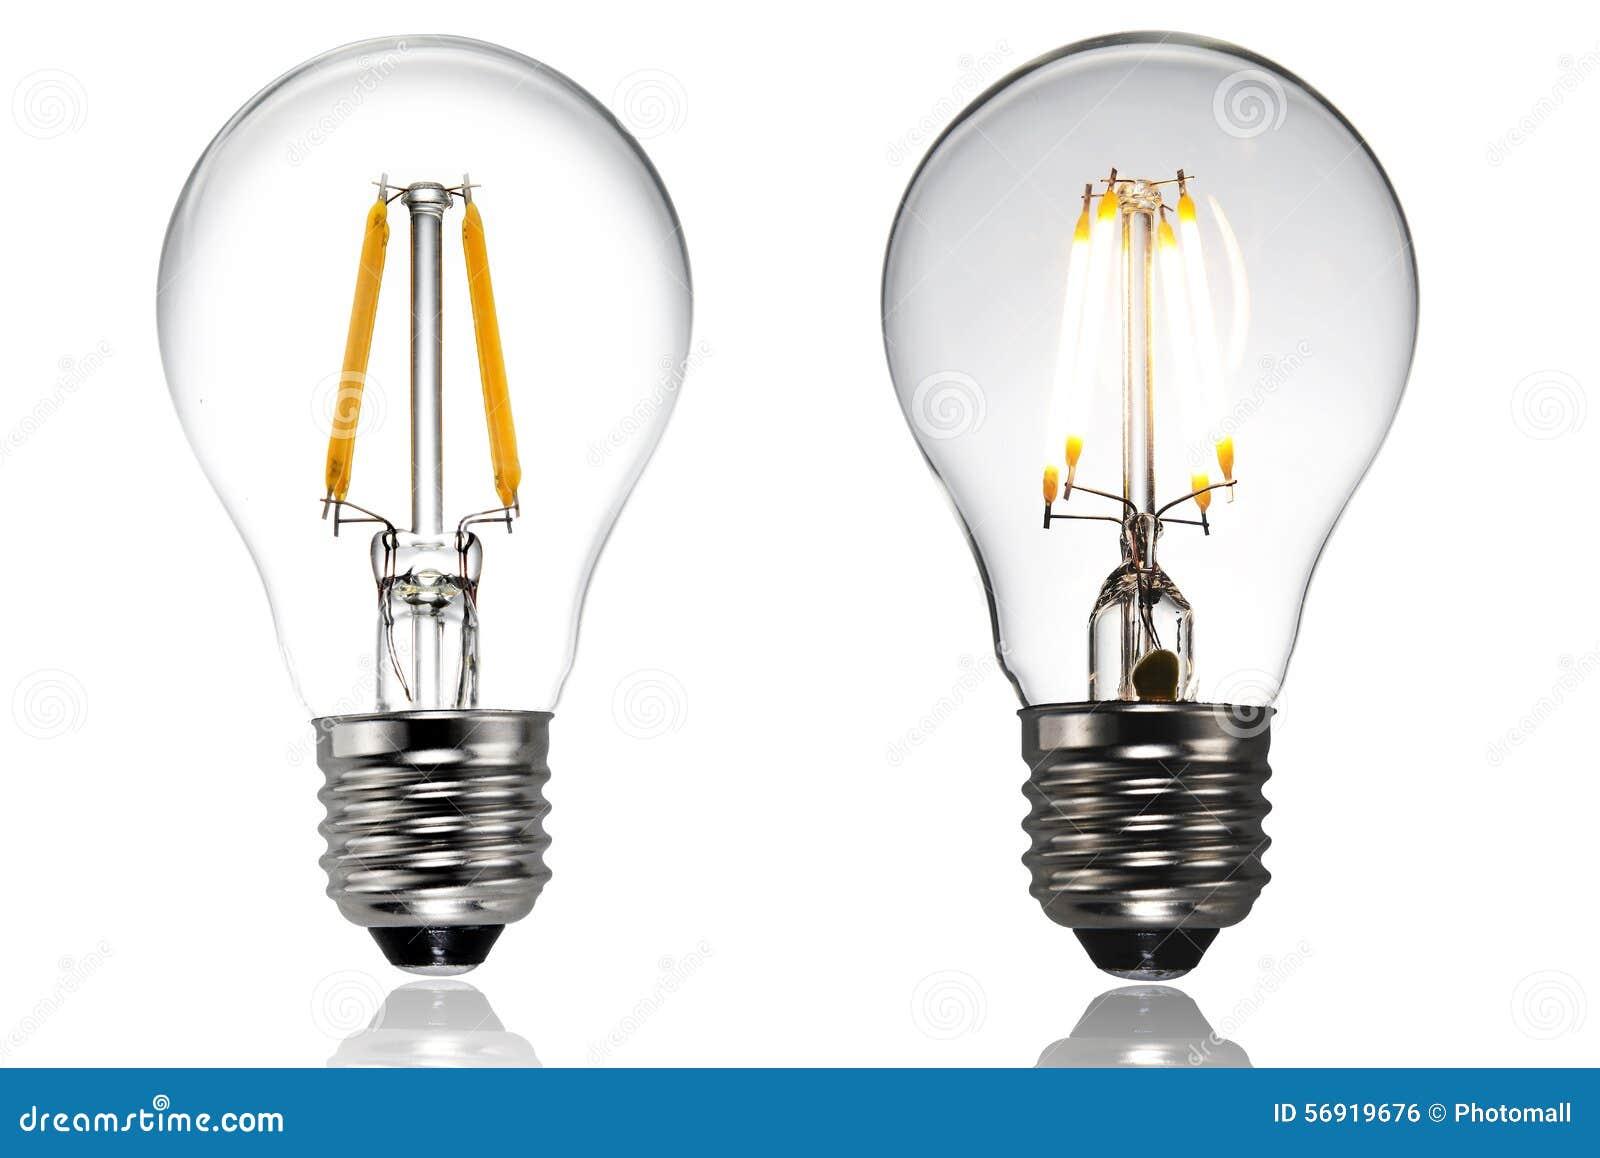 Led light bulb stock photo. Image of equipment, design - 56919676 for types of incandescent lamp  58lpg